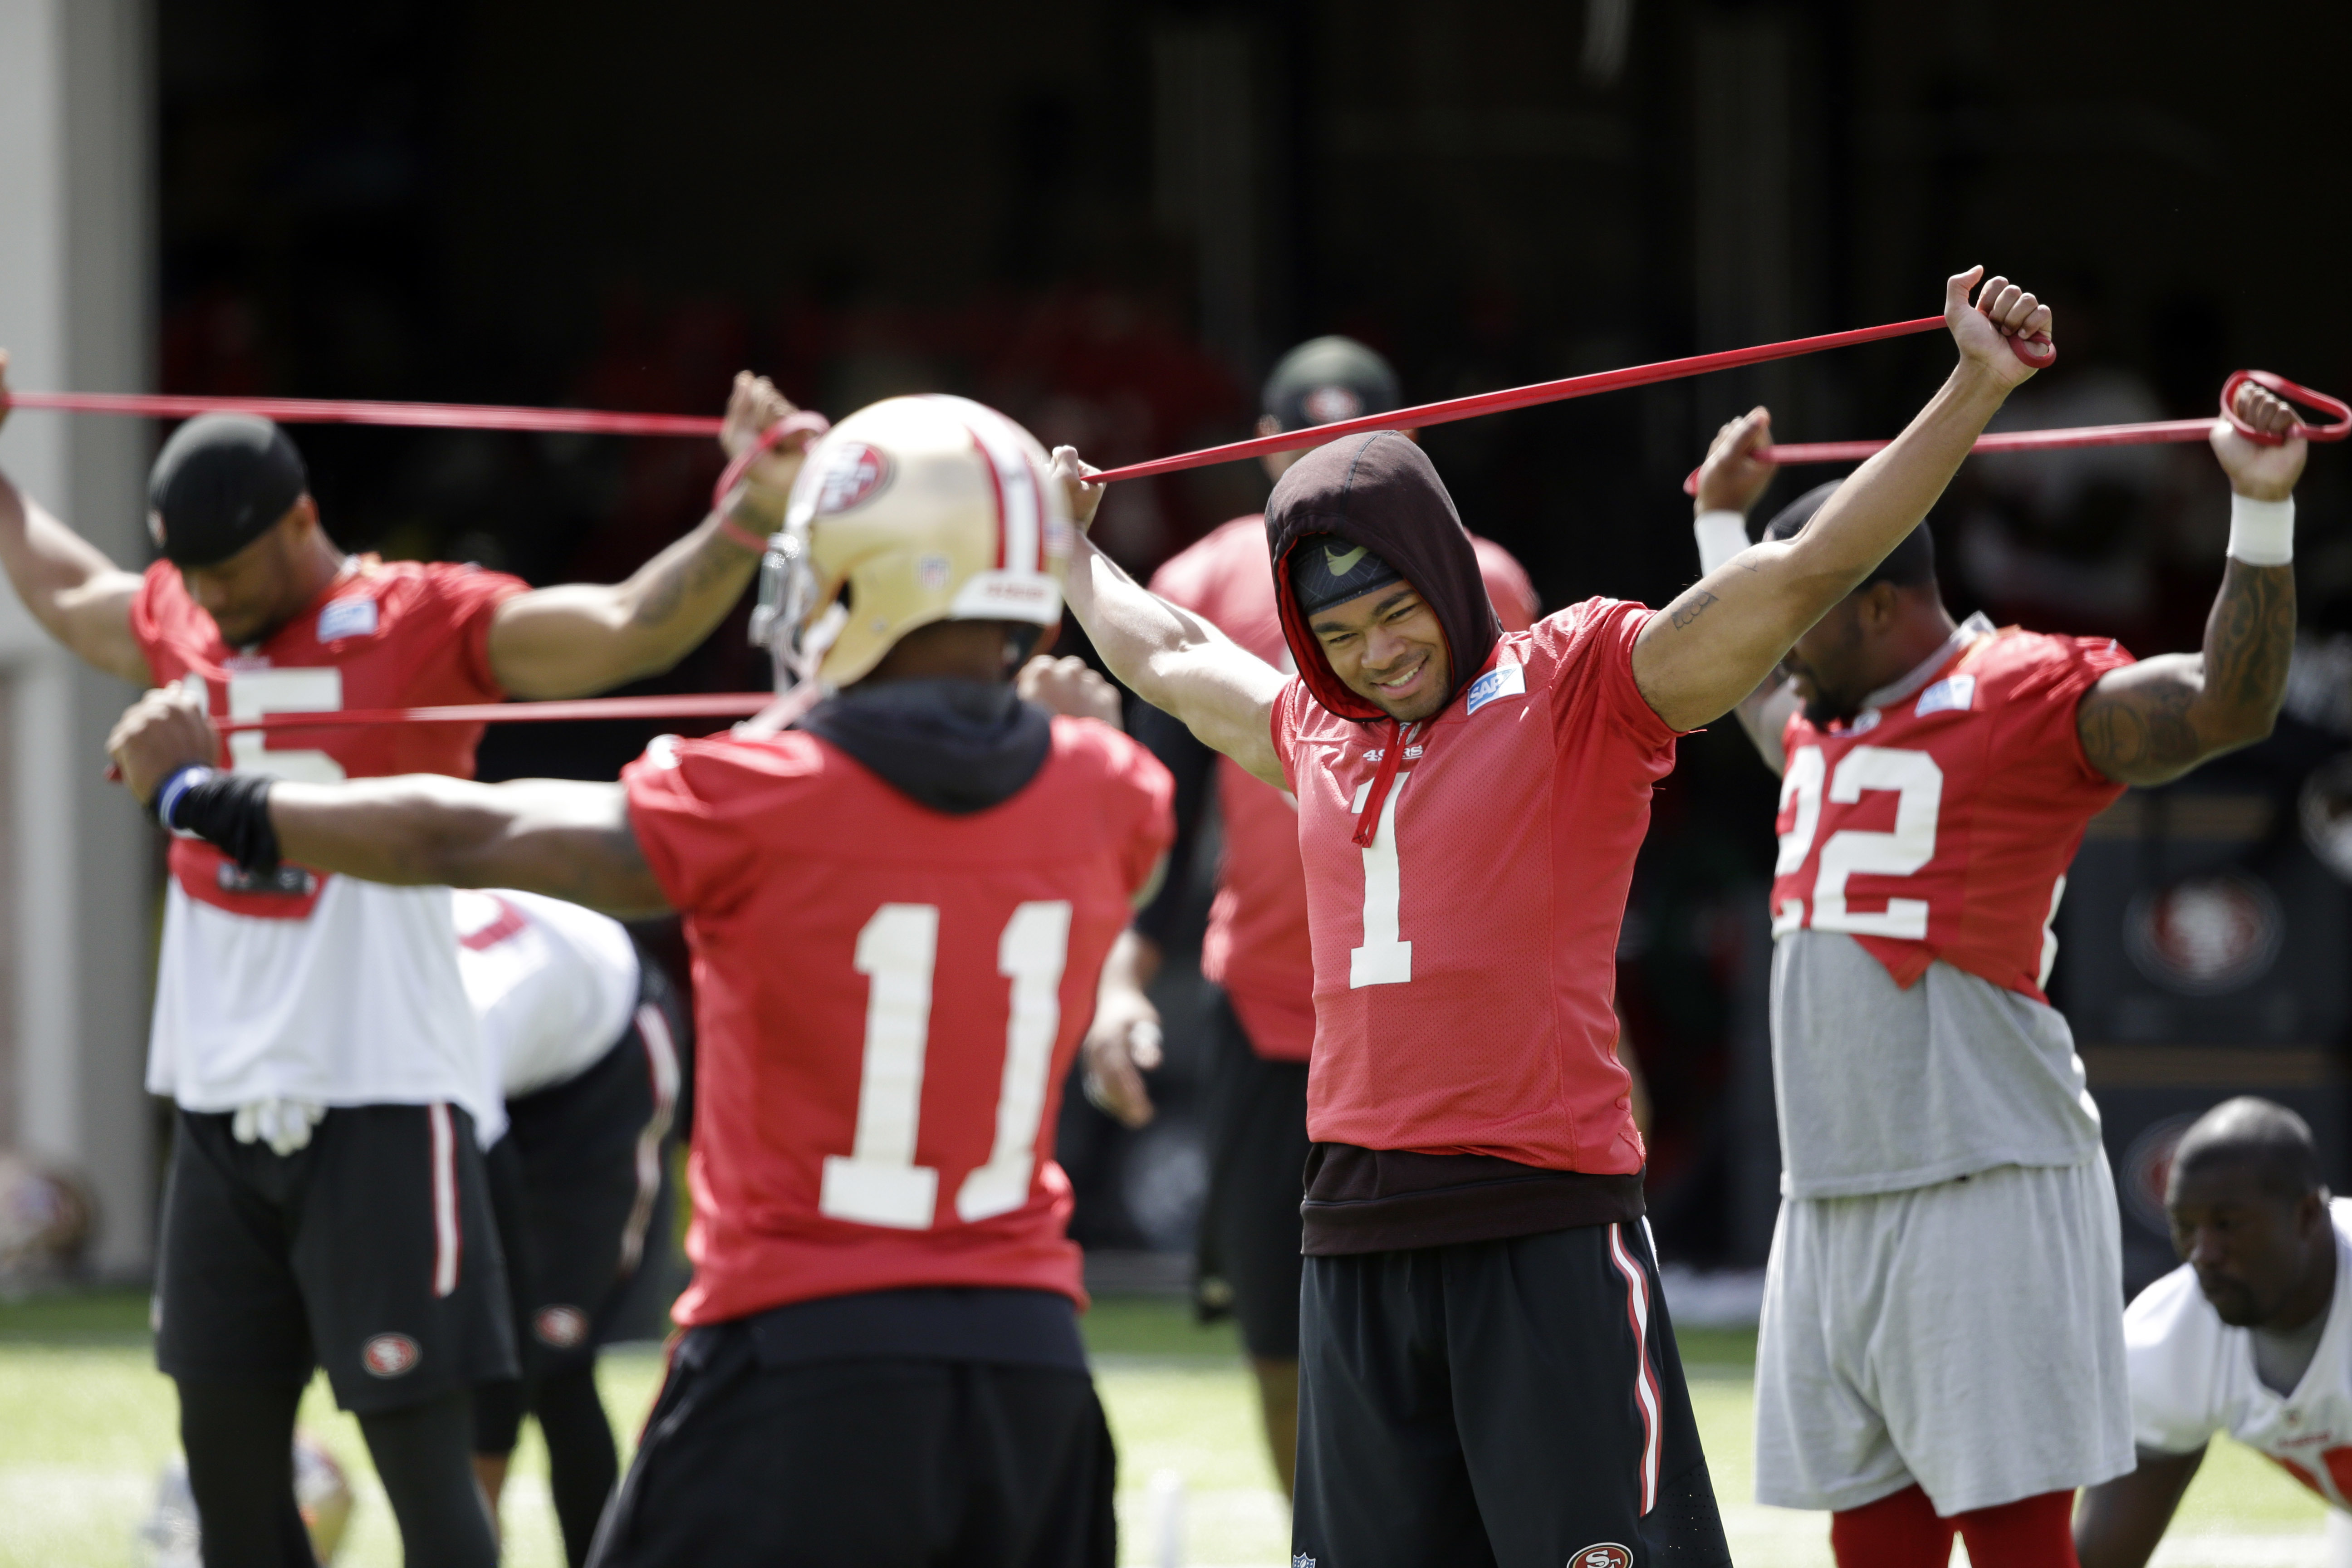 San Francisco 49ers players stretch during an NFL football practice Thursday, June 9, 2016, in Santa Clara, Calif. (AP Photo/Marcio Jose Sanchez)